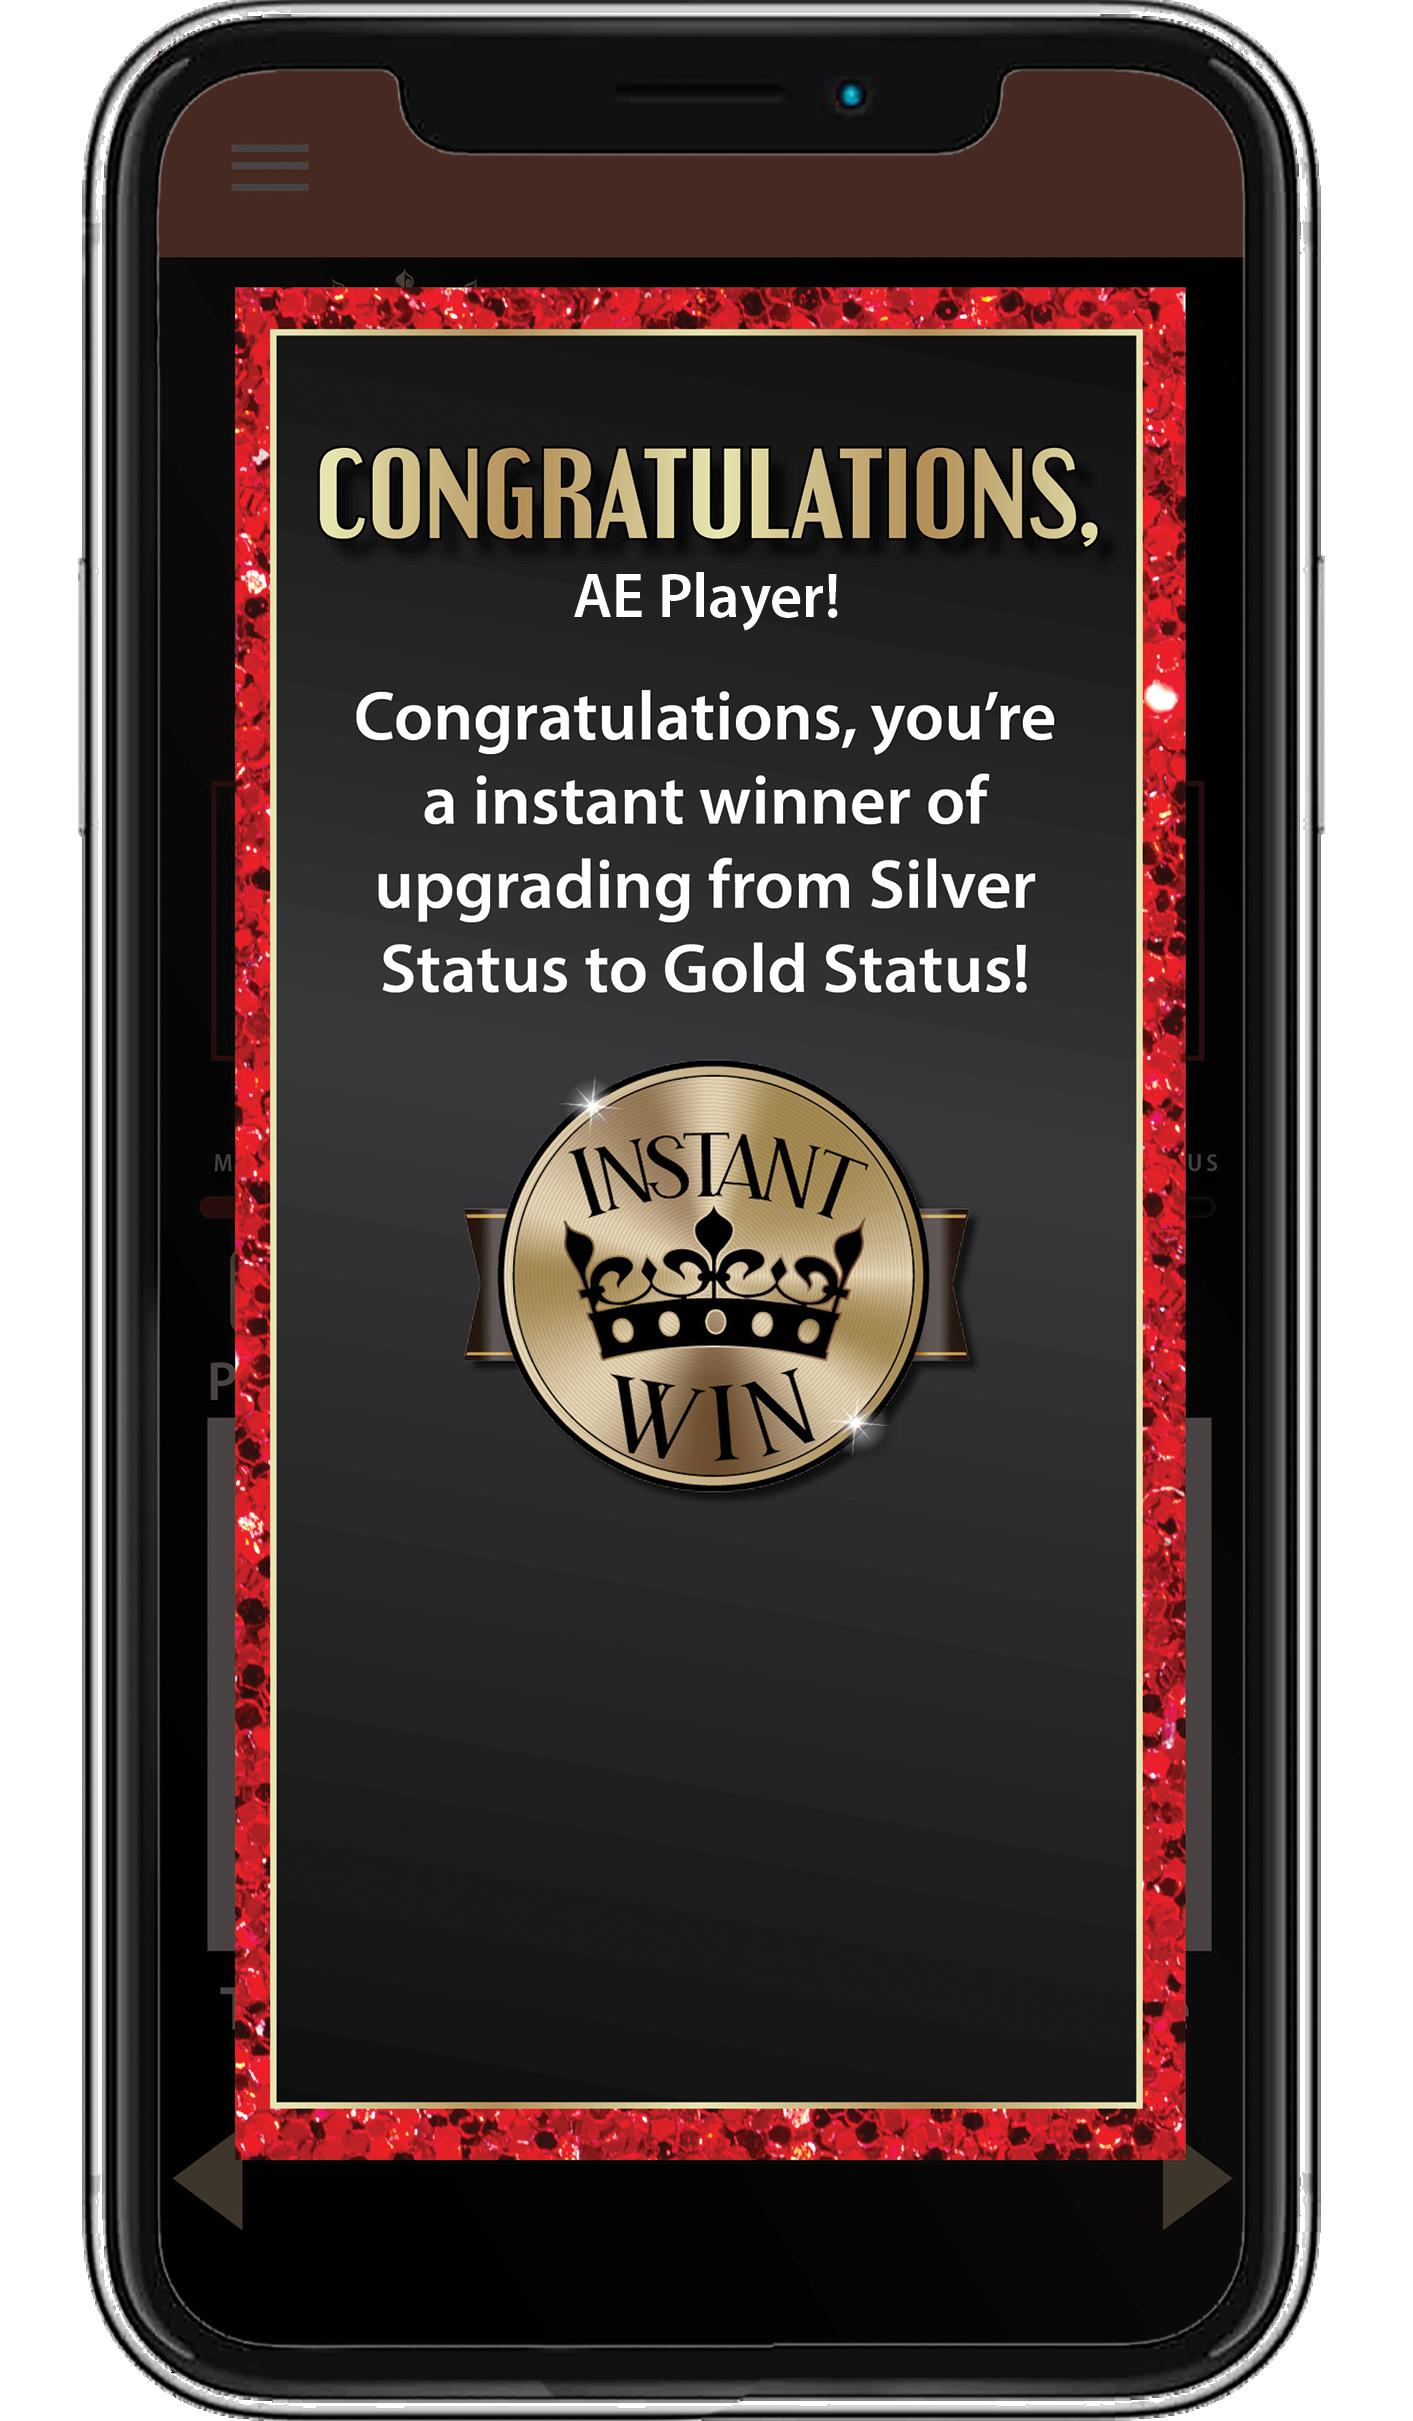 AEPlayer-Rewards-App_Congrats-Screen